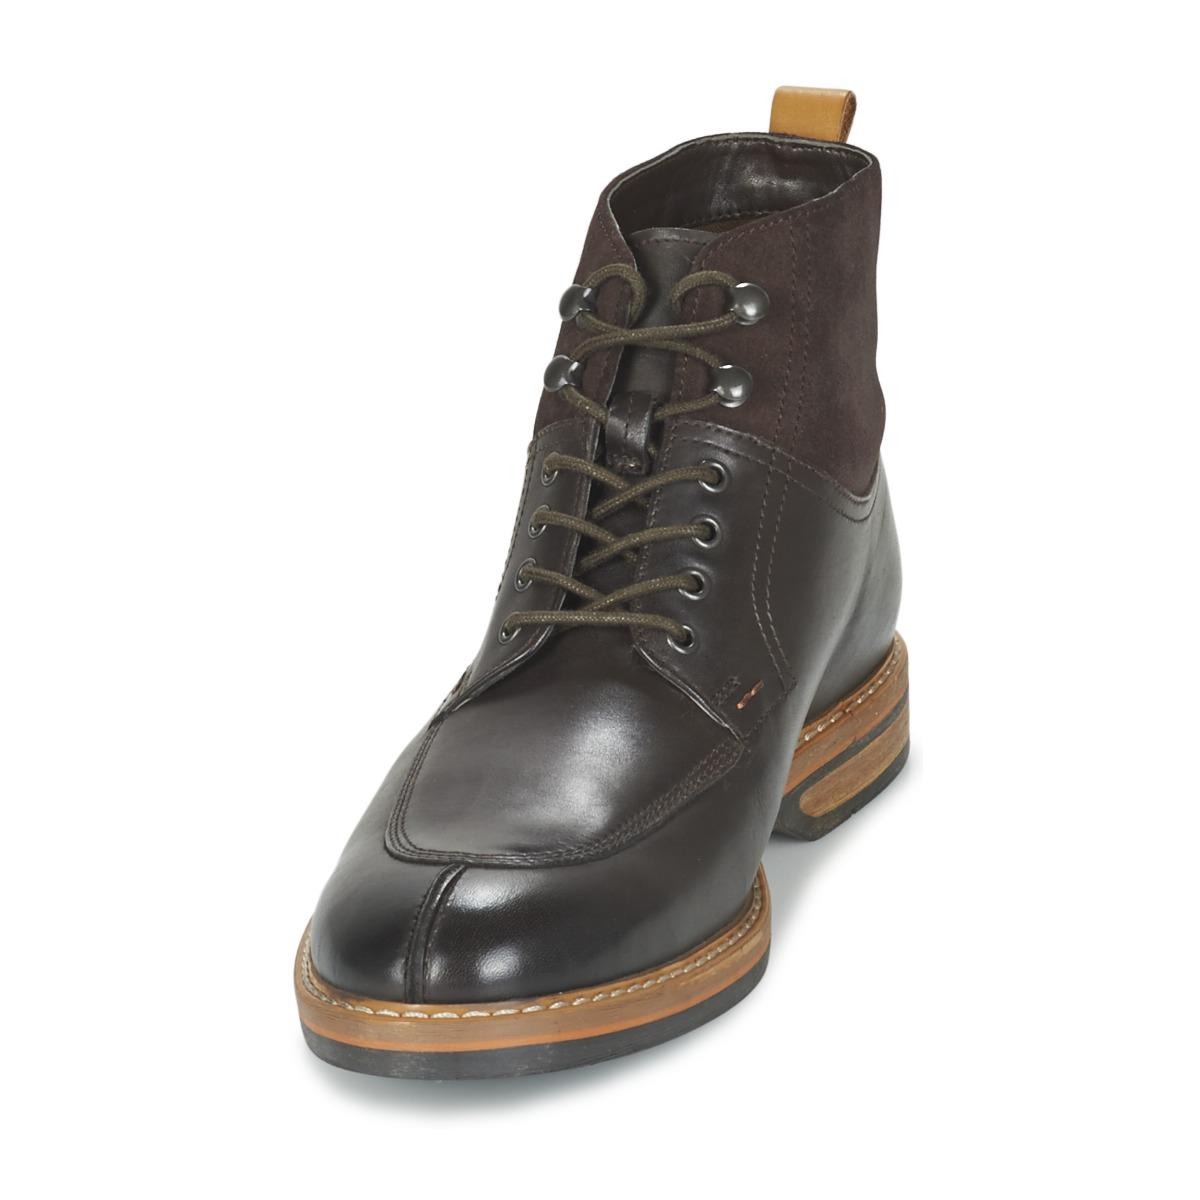 5b1fdeaebaac Clarks Pitney Hi Men s Mid Boots In Brown in Brown for Men - Lyst